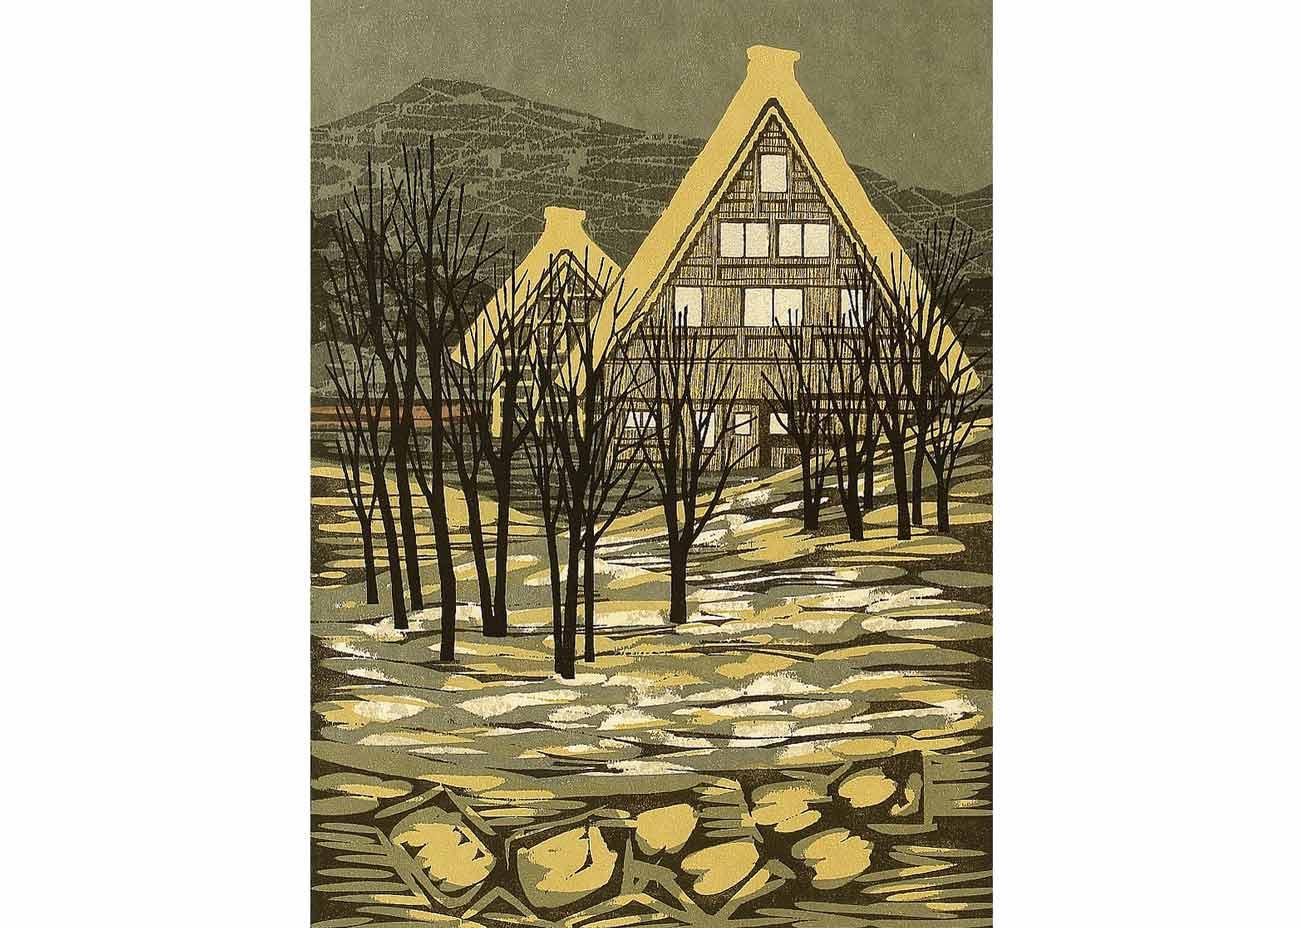 © Fumio Fujita, Silent Village in Hida, 1973 Woodblock Print